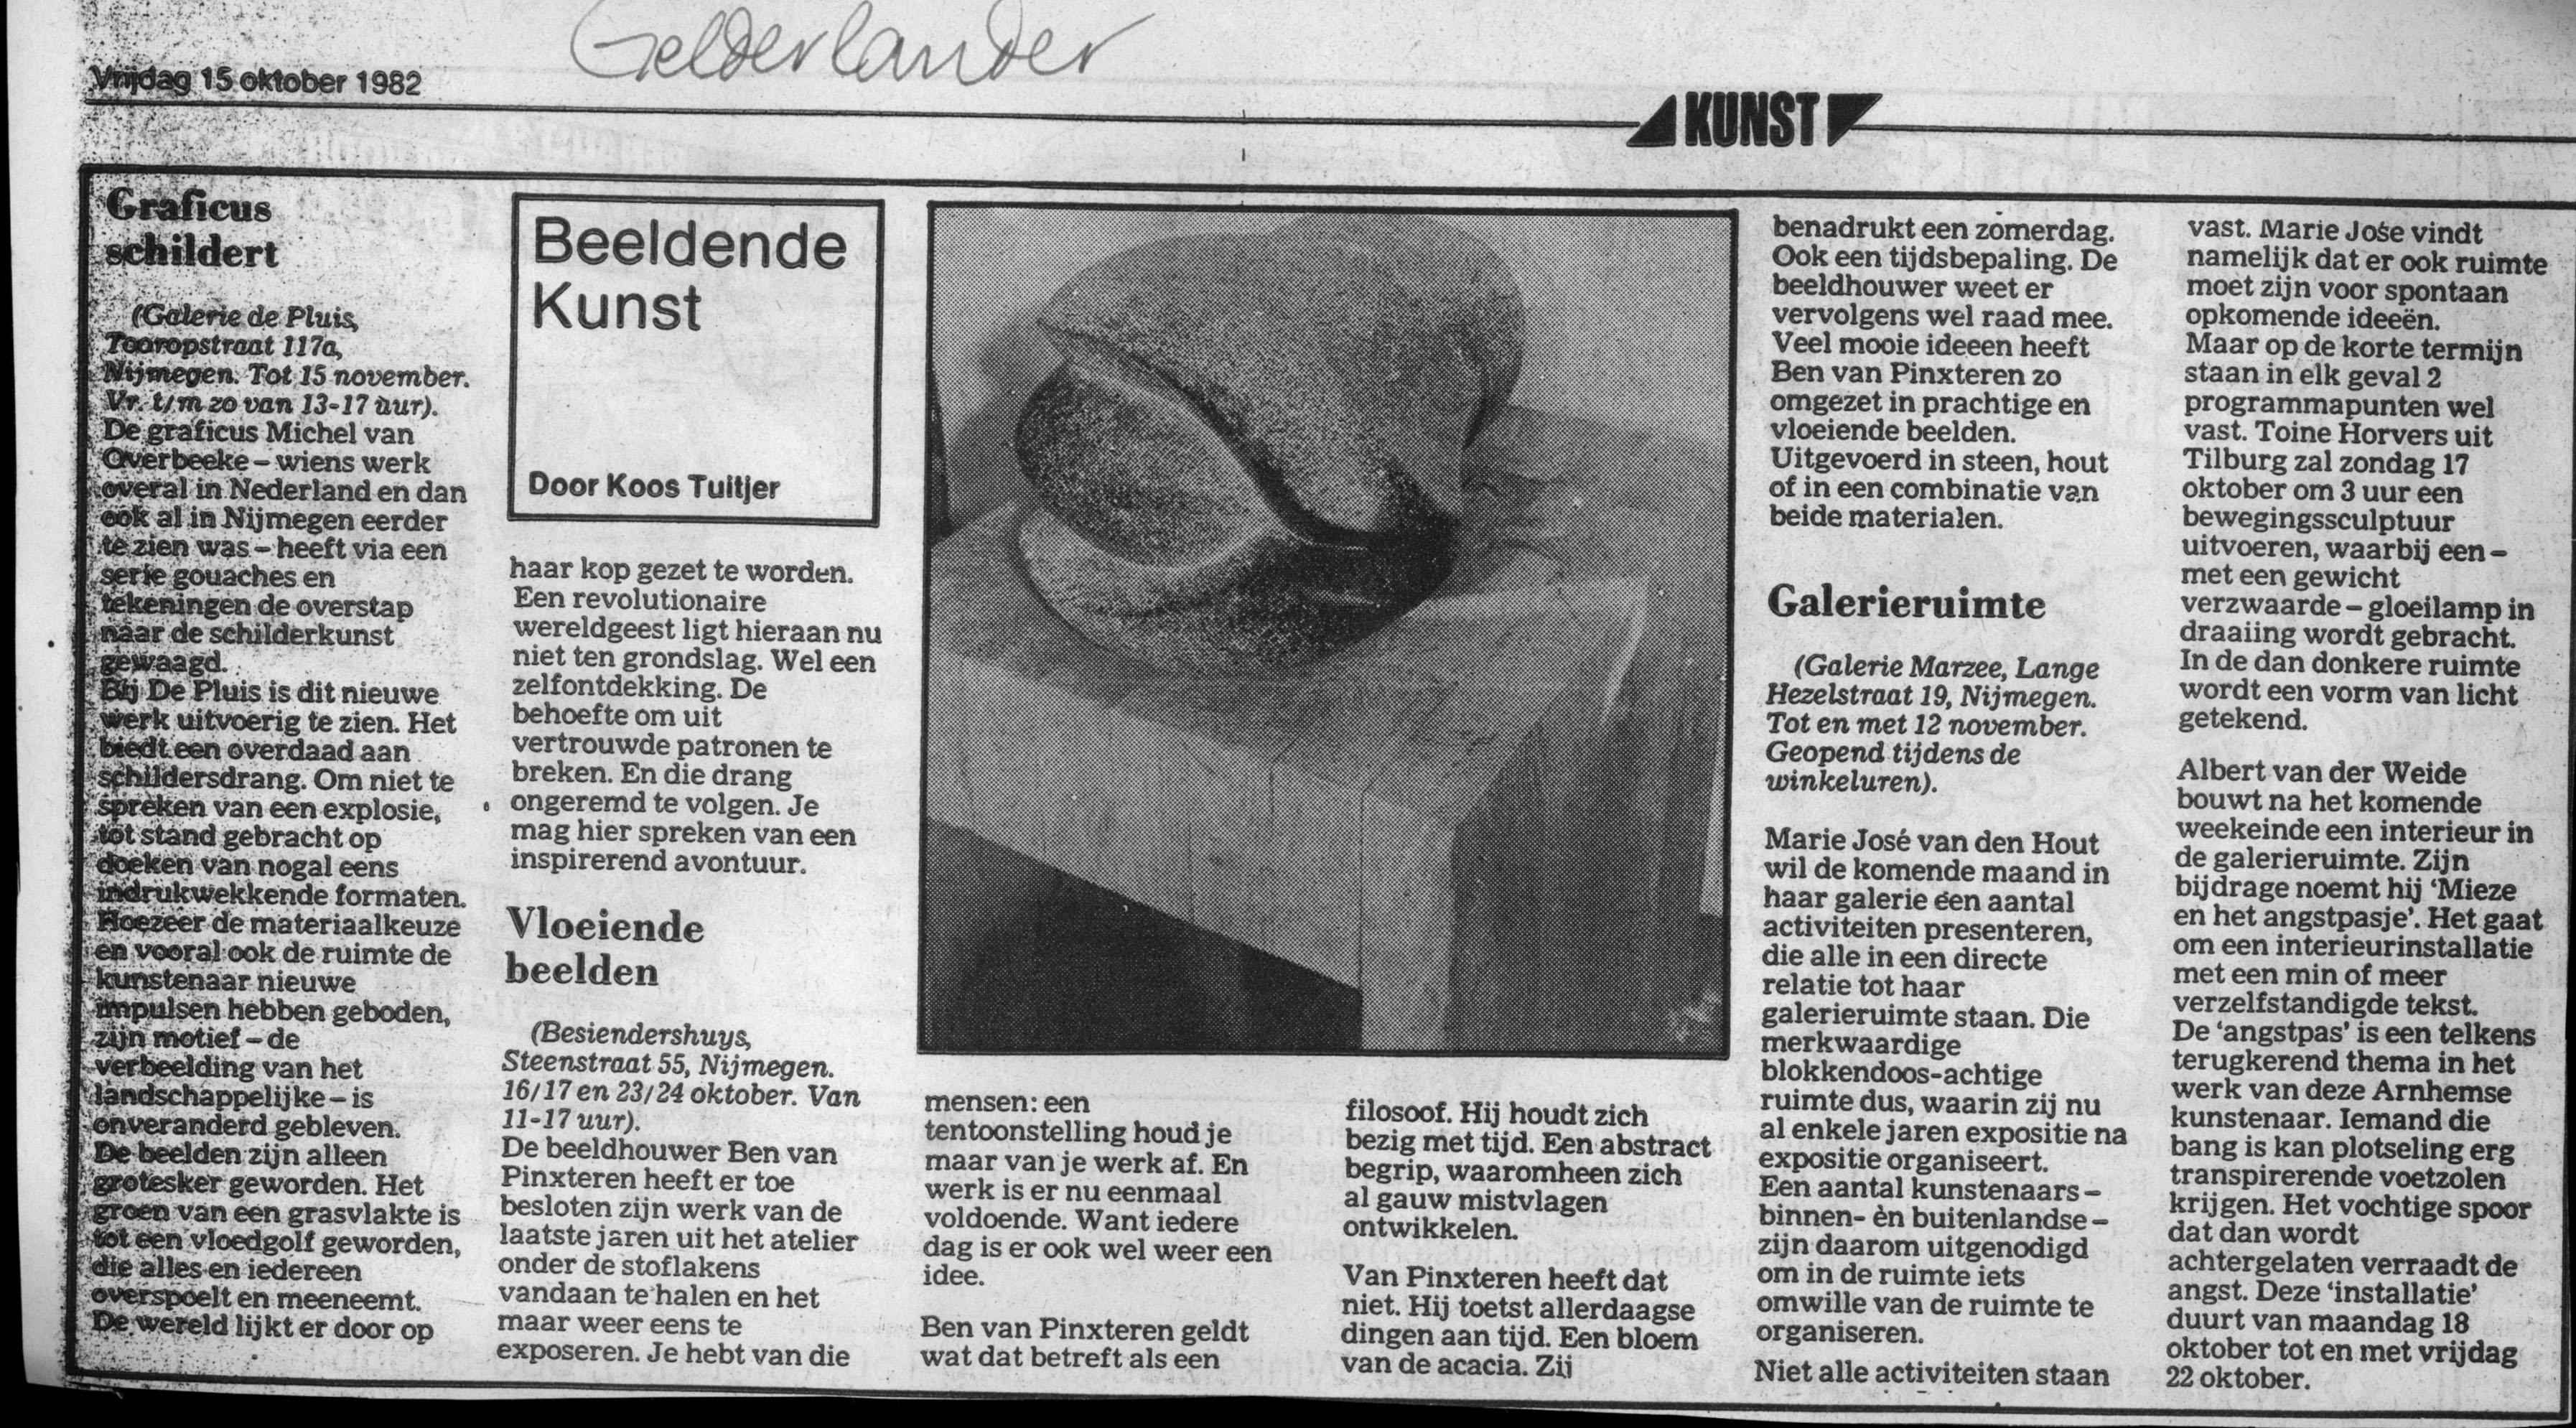 Beeldende Kunst, De Gelderlander, 15 oktober 1982, Galerie Marzee, drukwerk, krant, papier